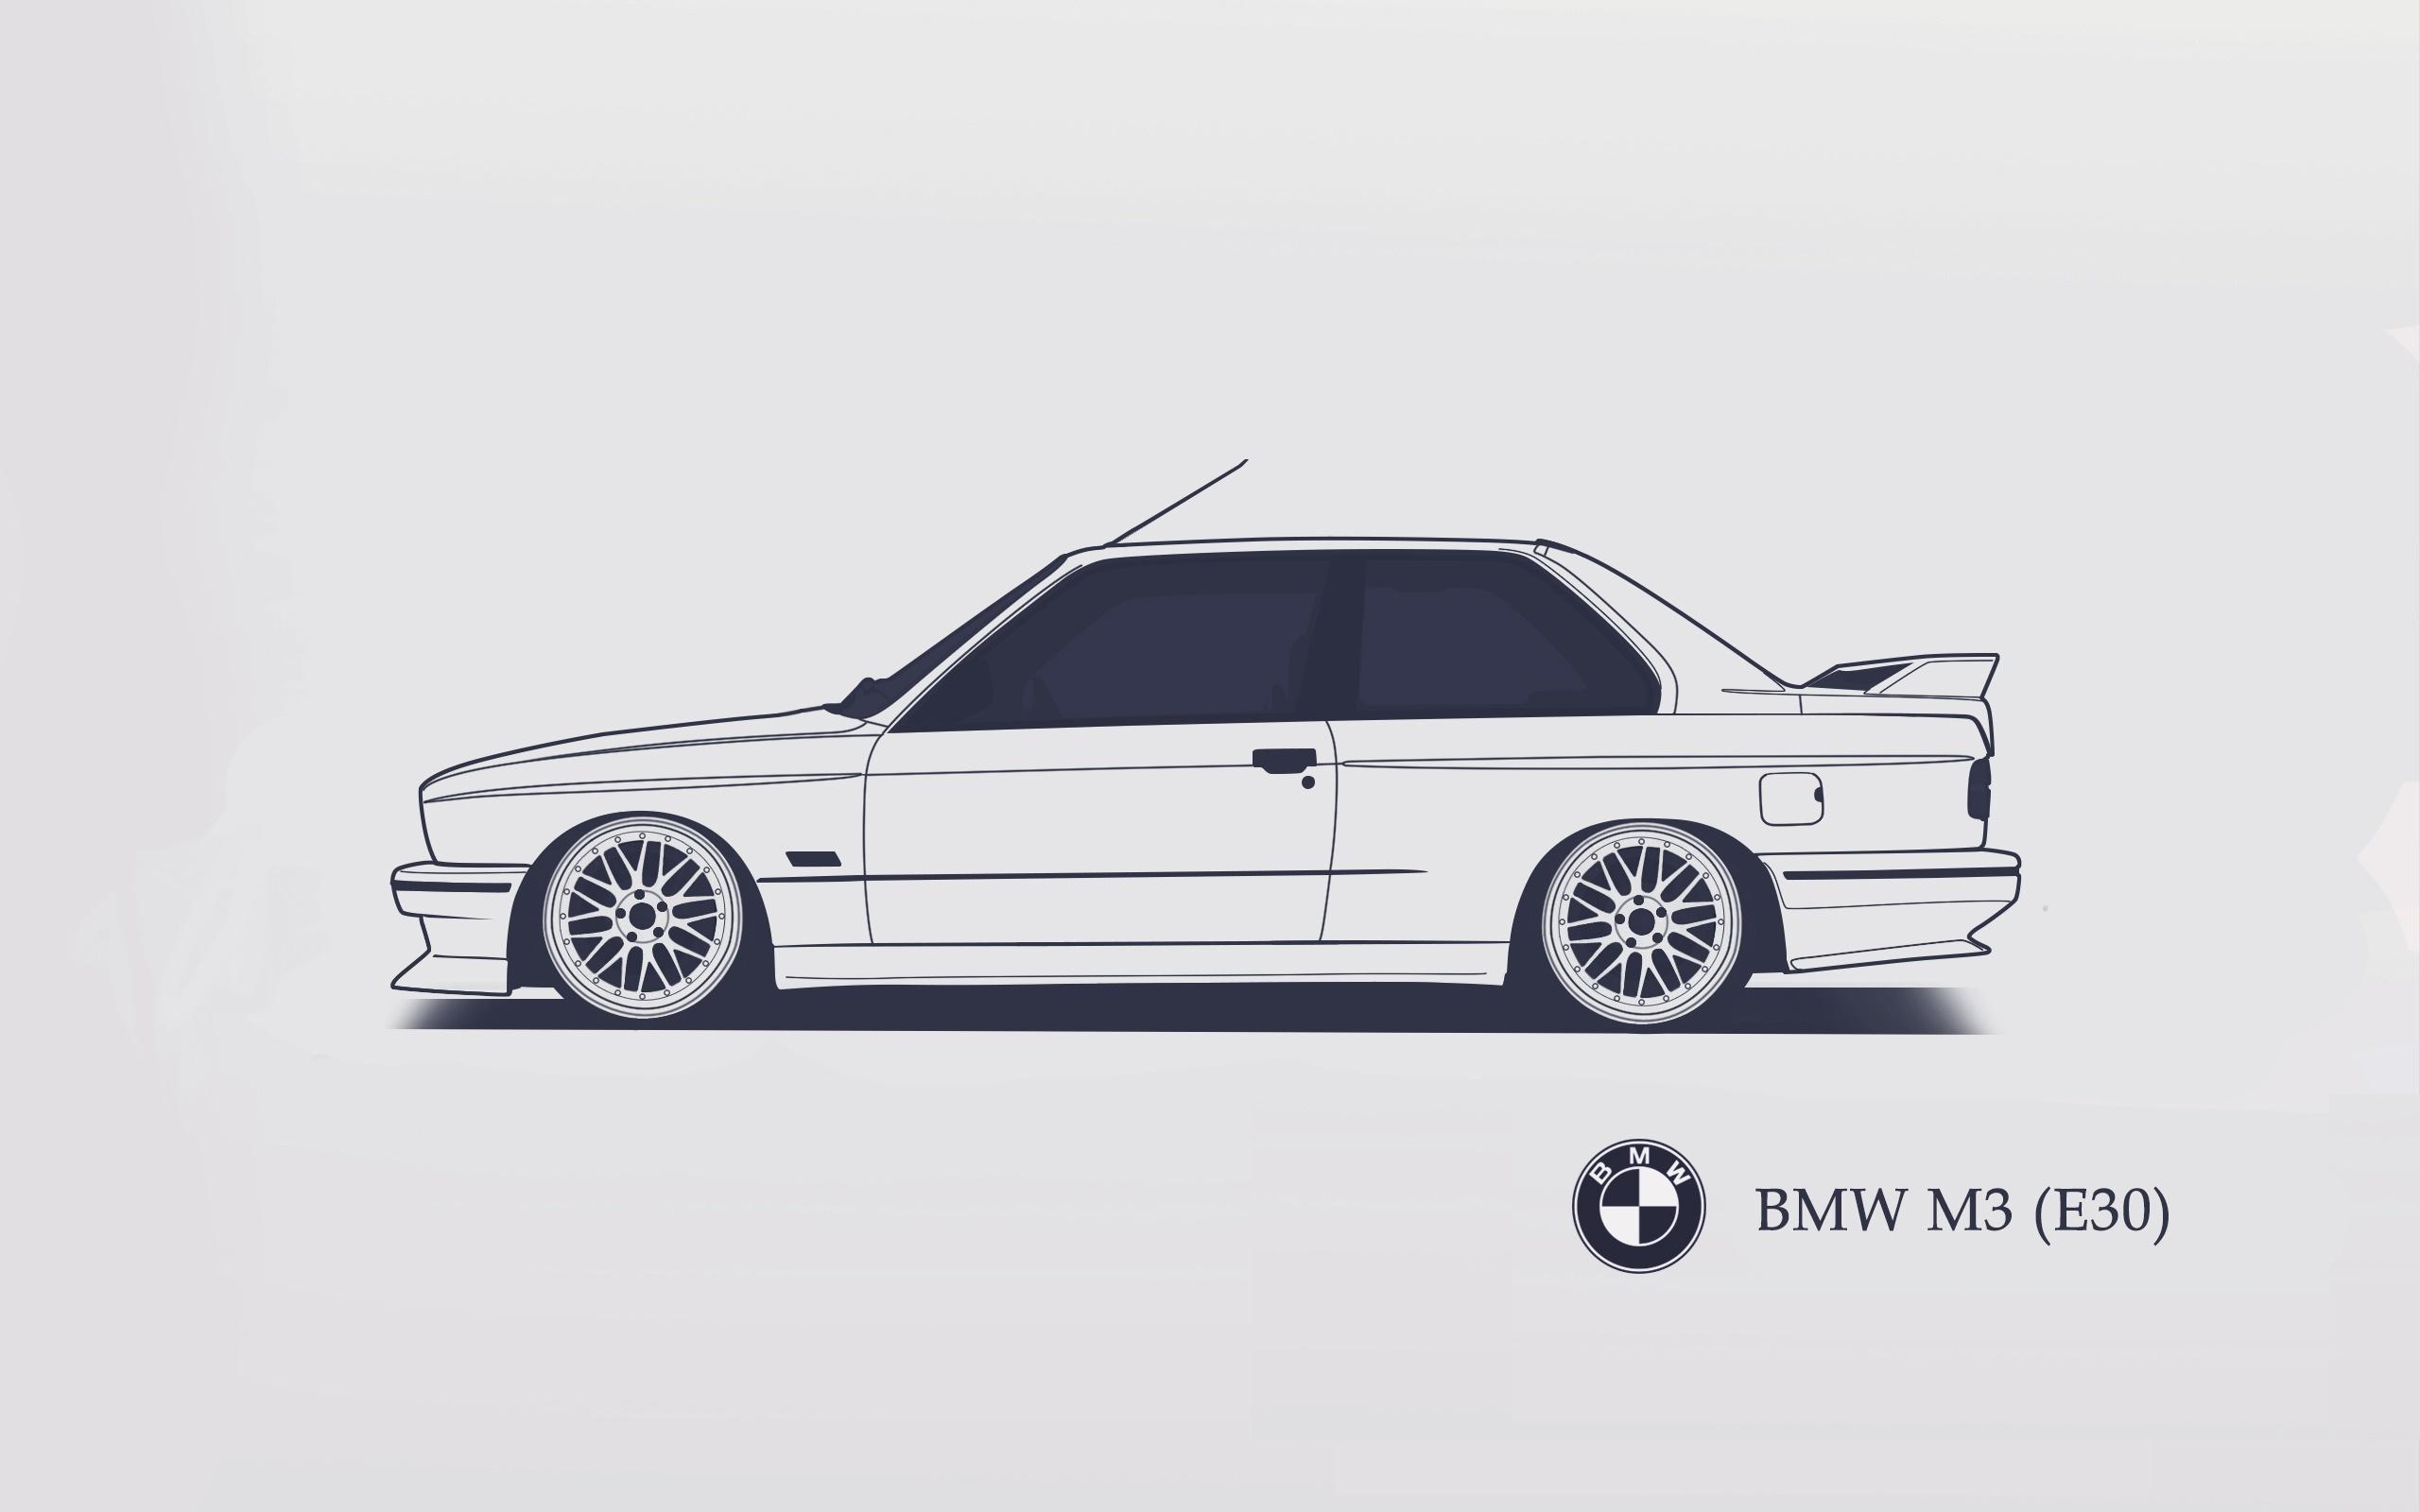 Download Wallpaper Bmw E30 Minimalistic Srcky Design Section